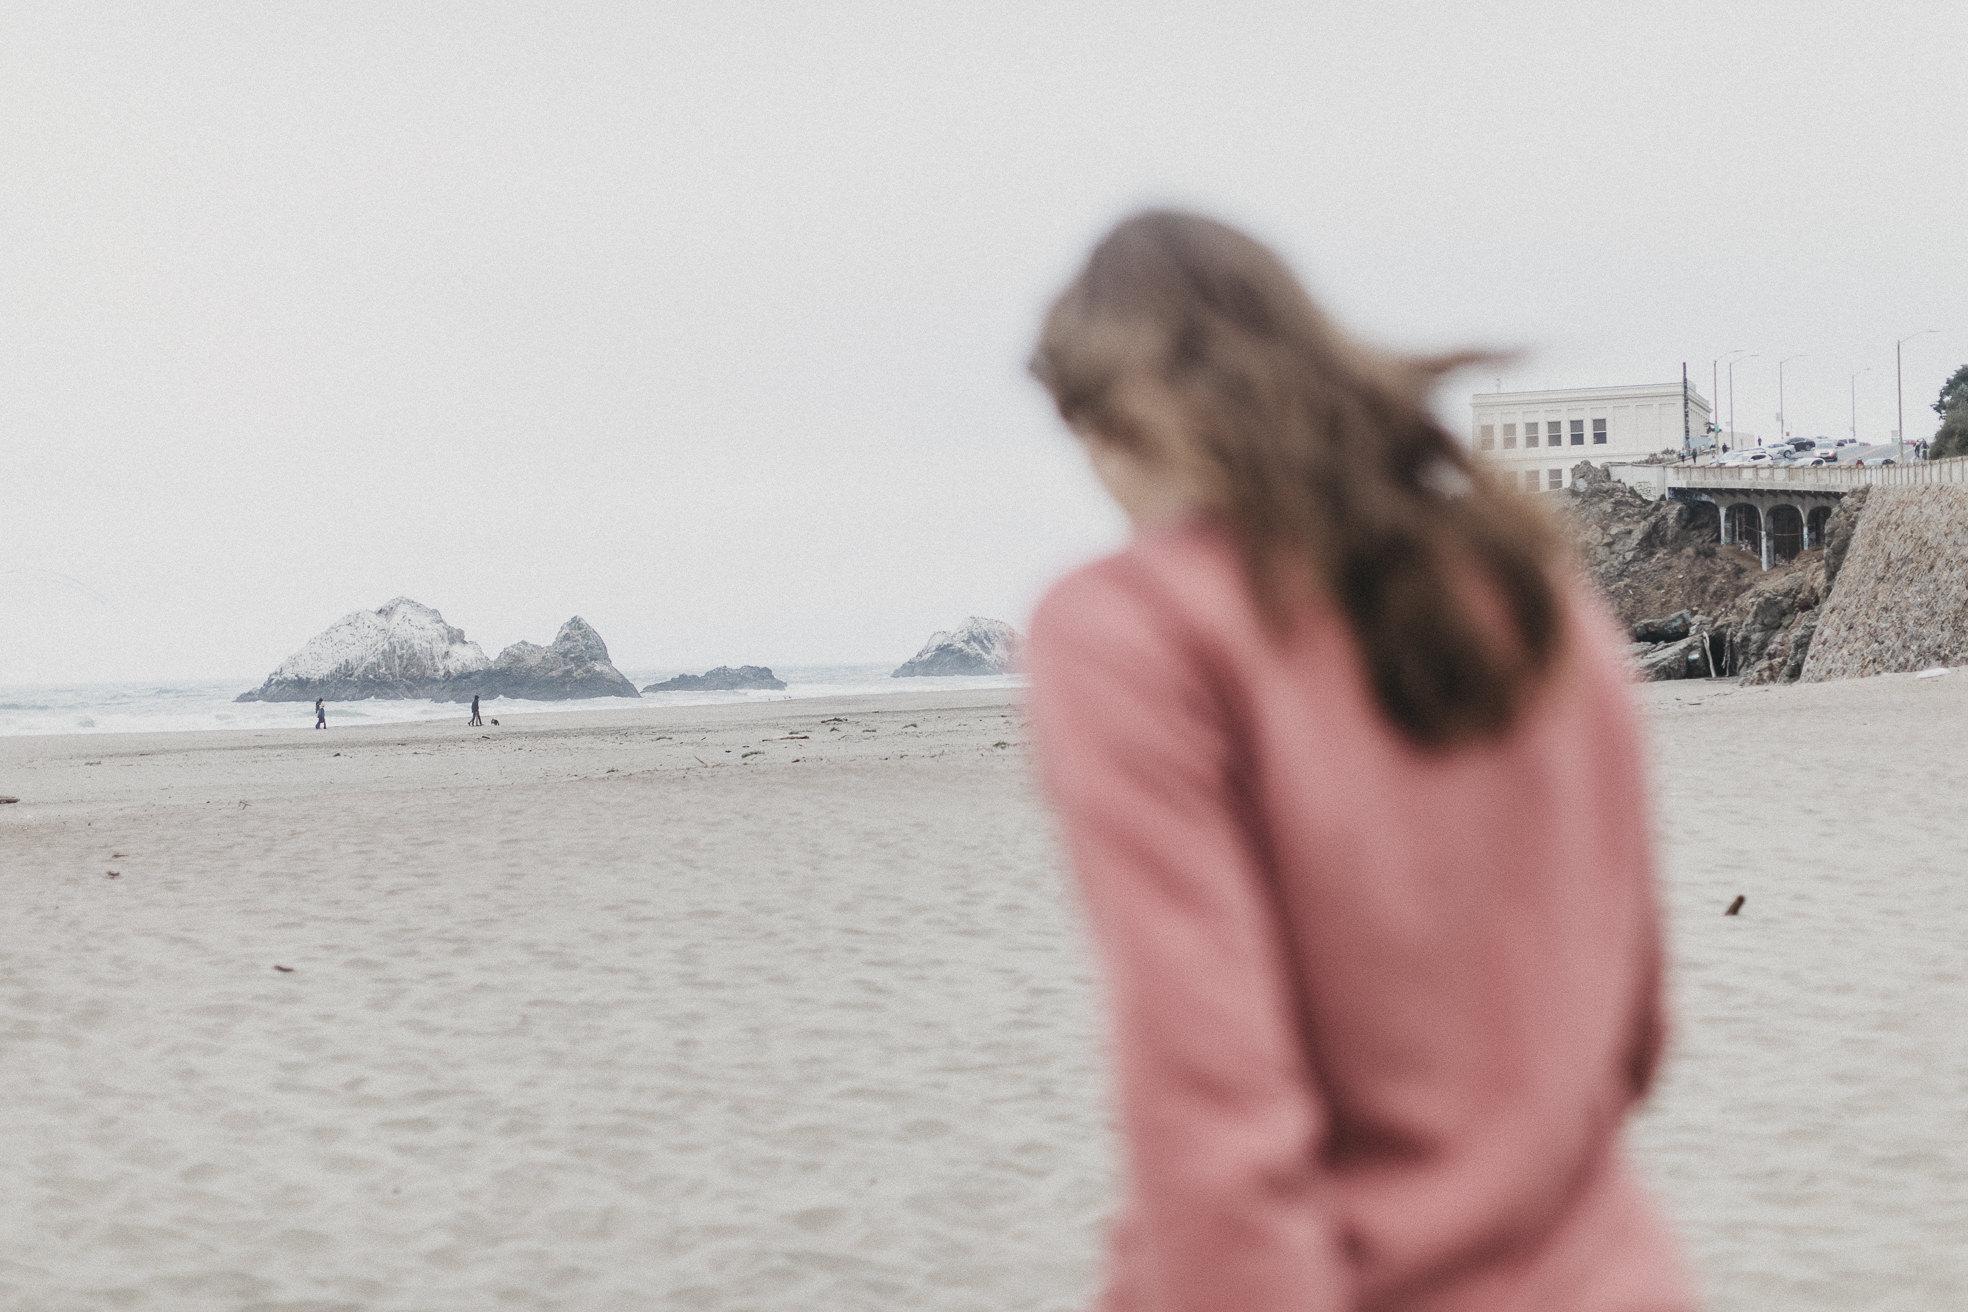 San-Francisco-BildervomLeben-8151